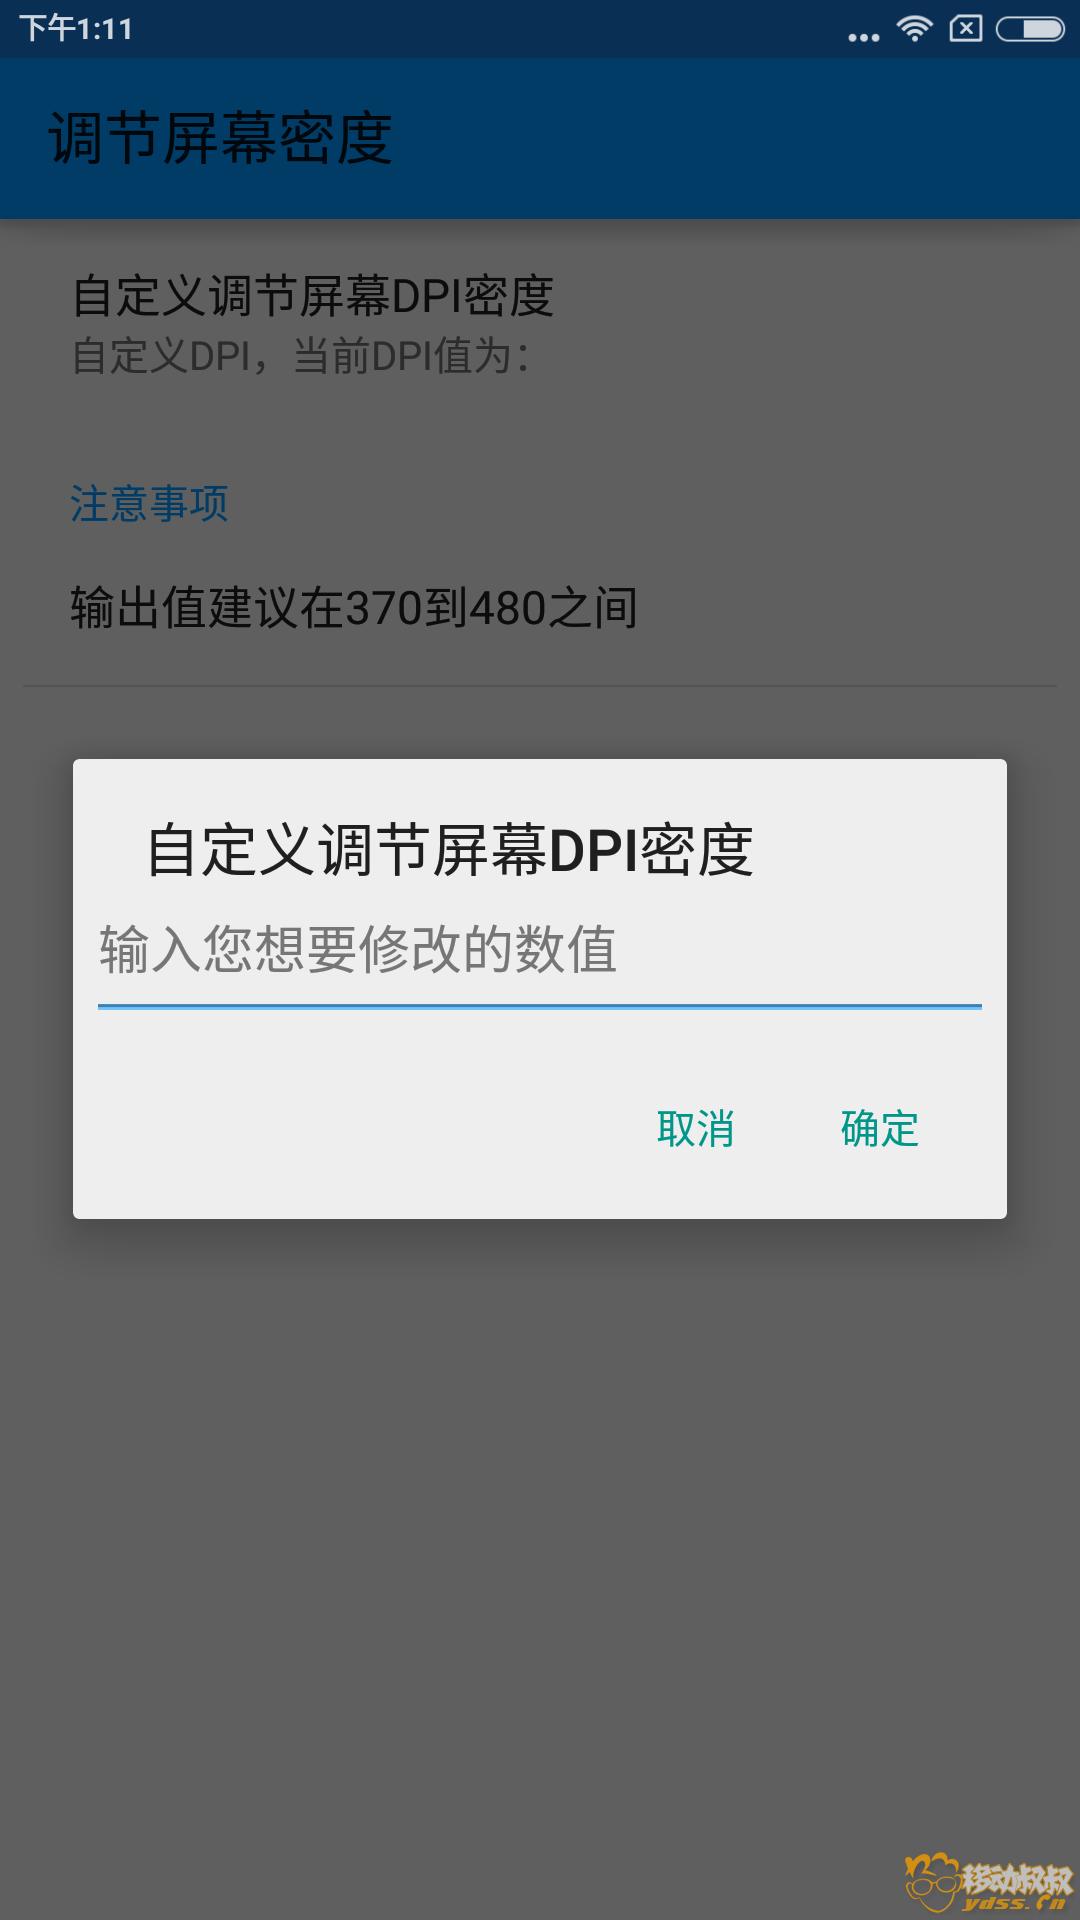 Screenshot_2017-11-29-13-11-23-161_com.zhanhong.tools.png